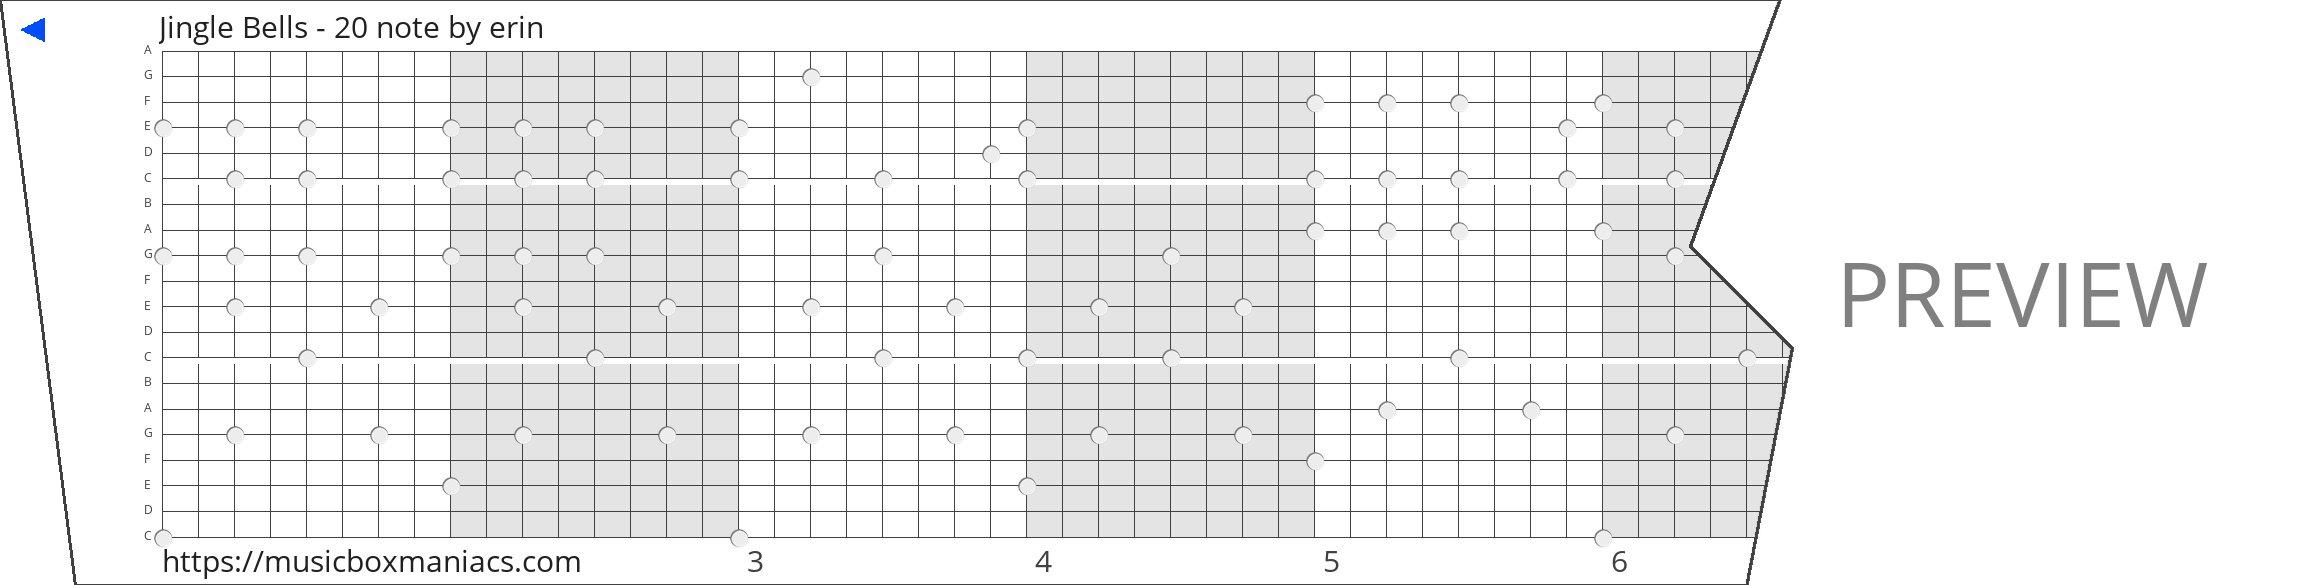 Jingle Bells - 20 note 20 note music box paper strip